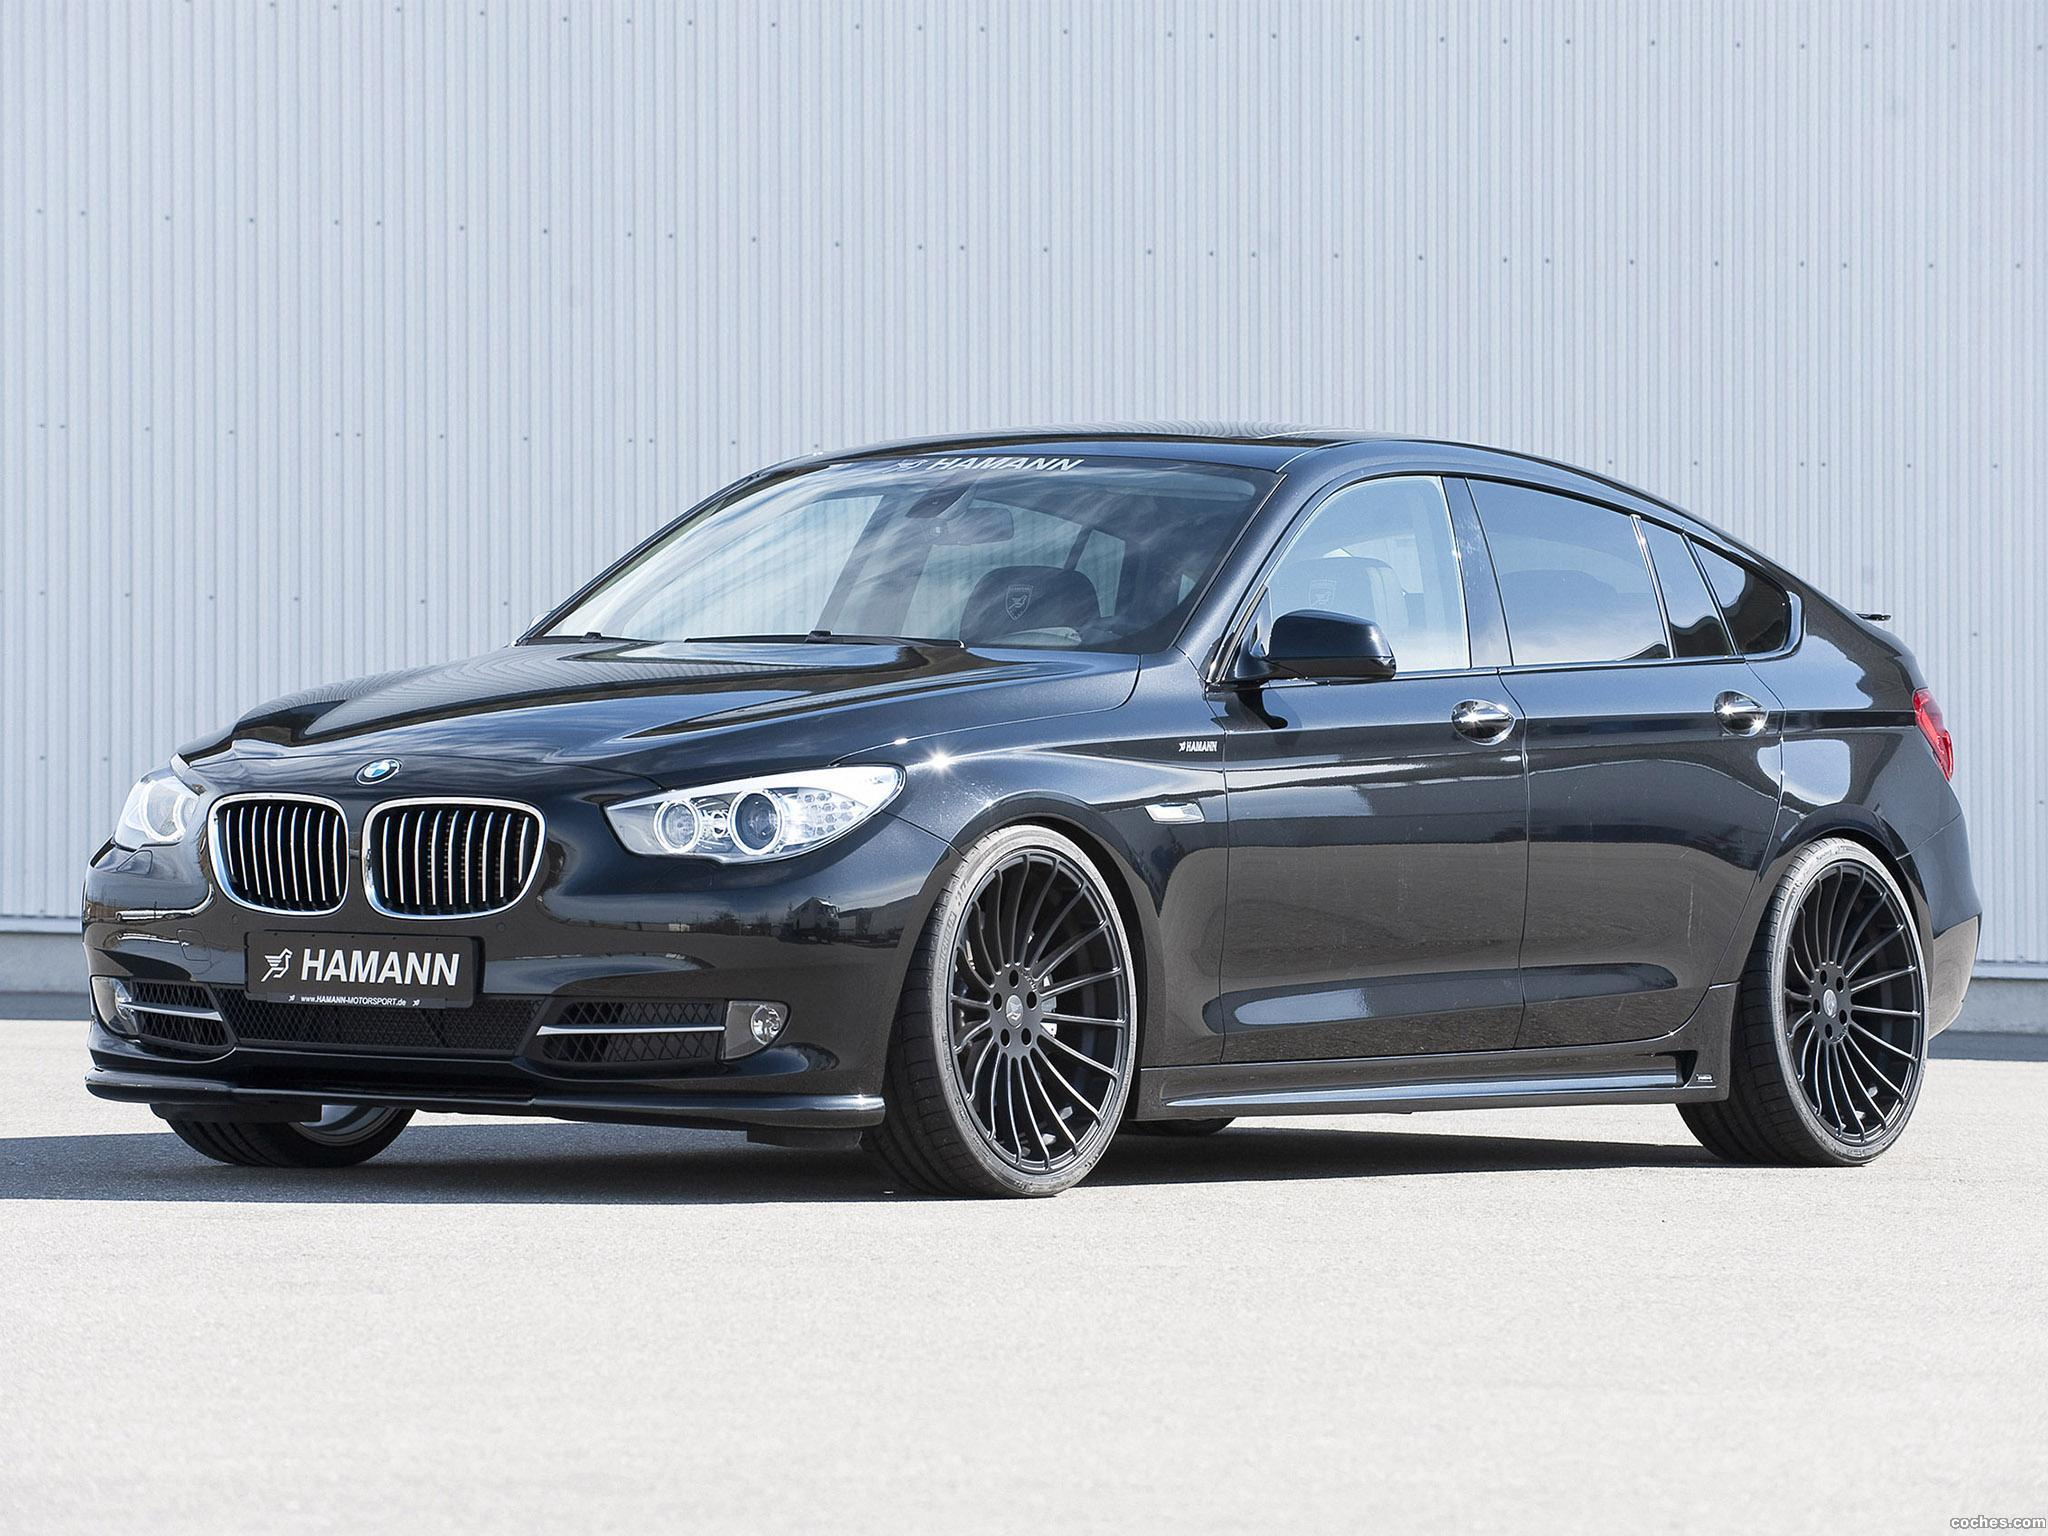 Foto 3 de BMW Hamann Serie 5 Gran Turismo 2010